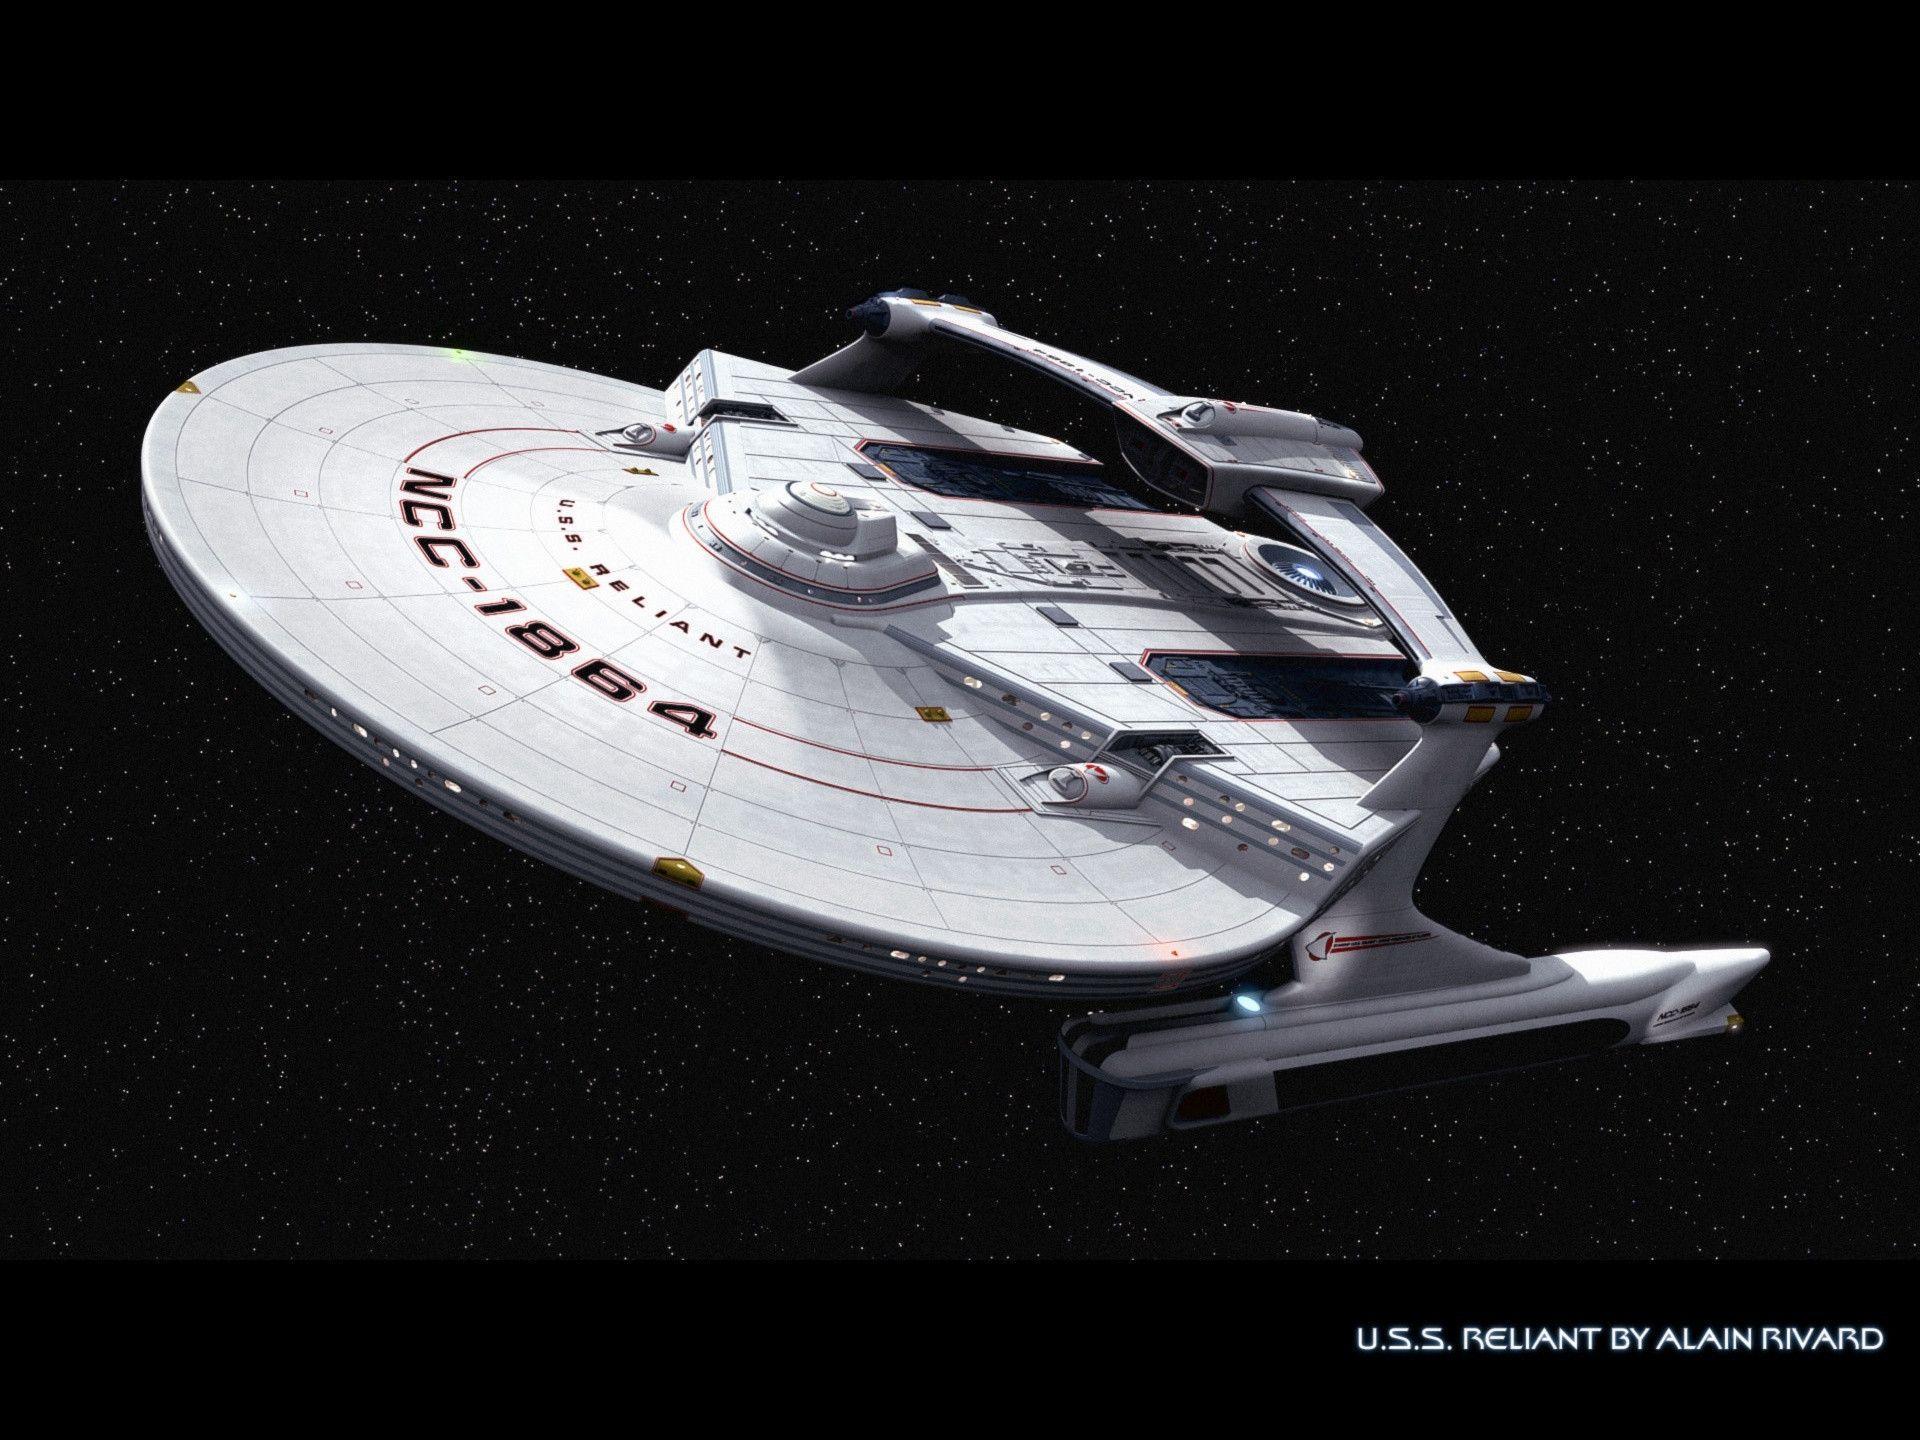 Star Trek Ships Wallpapers 1920x1440